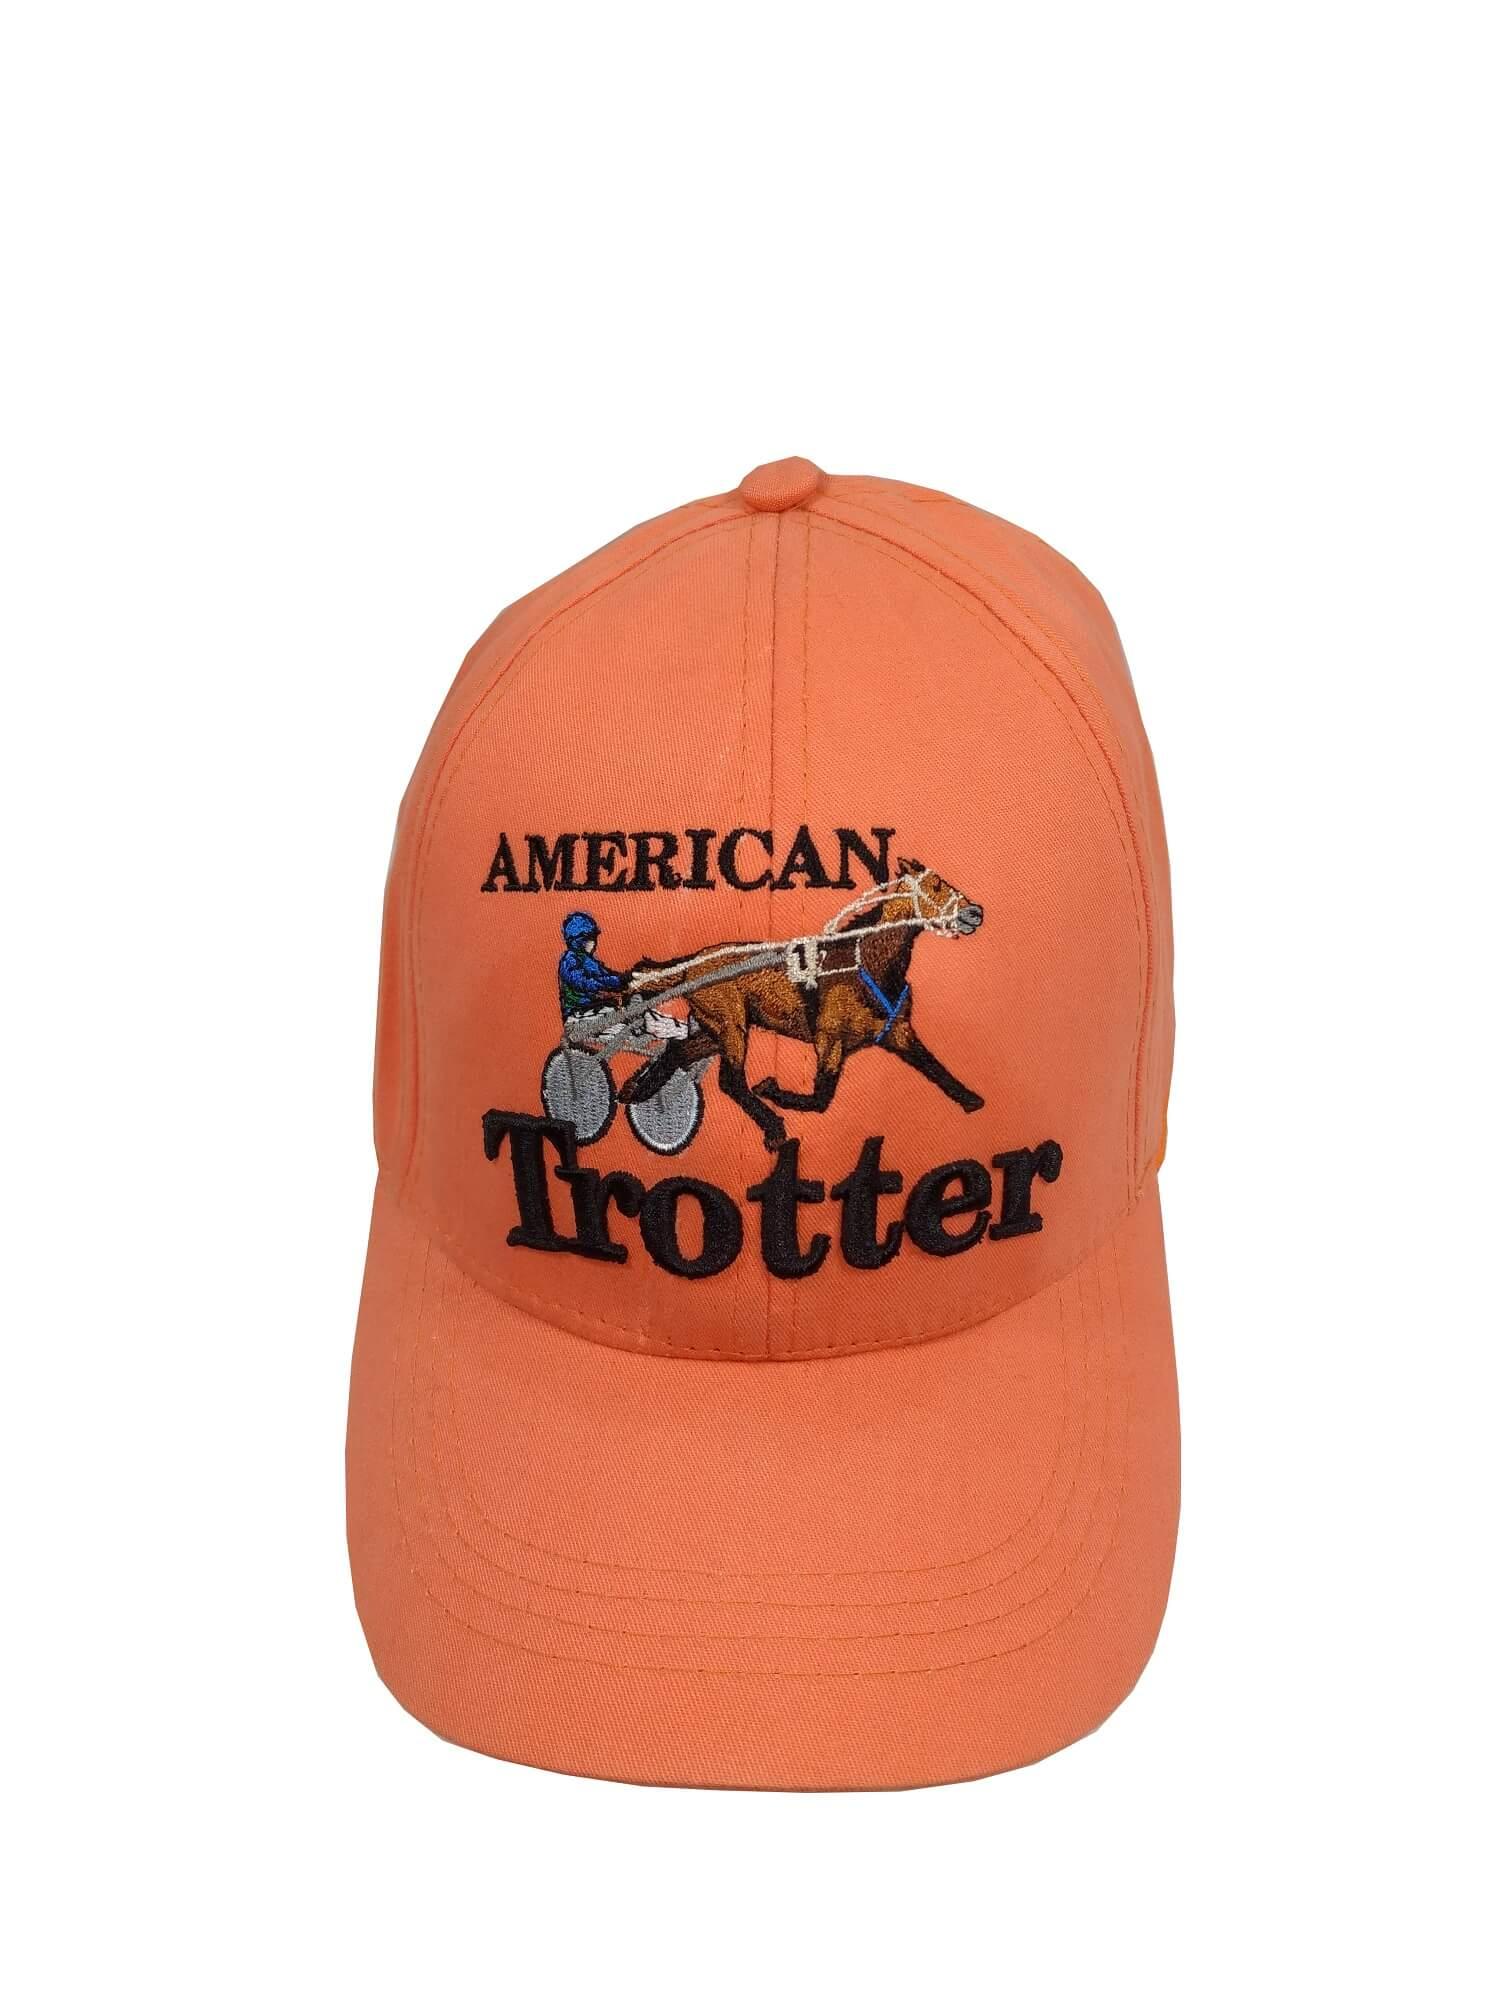 Boné American Trotter Laranja Ref. 7786